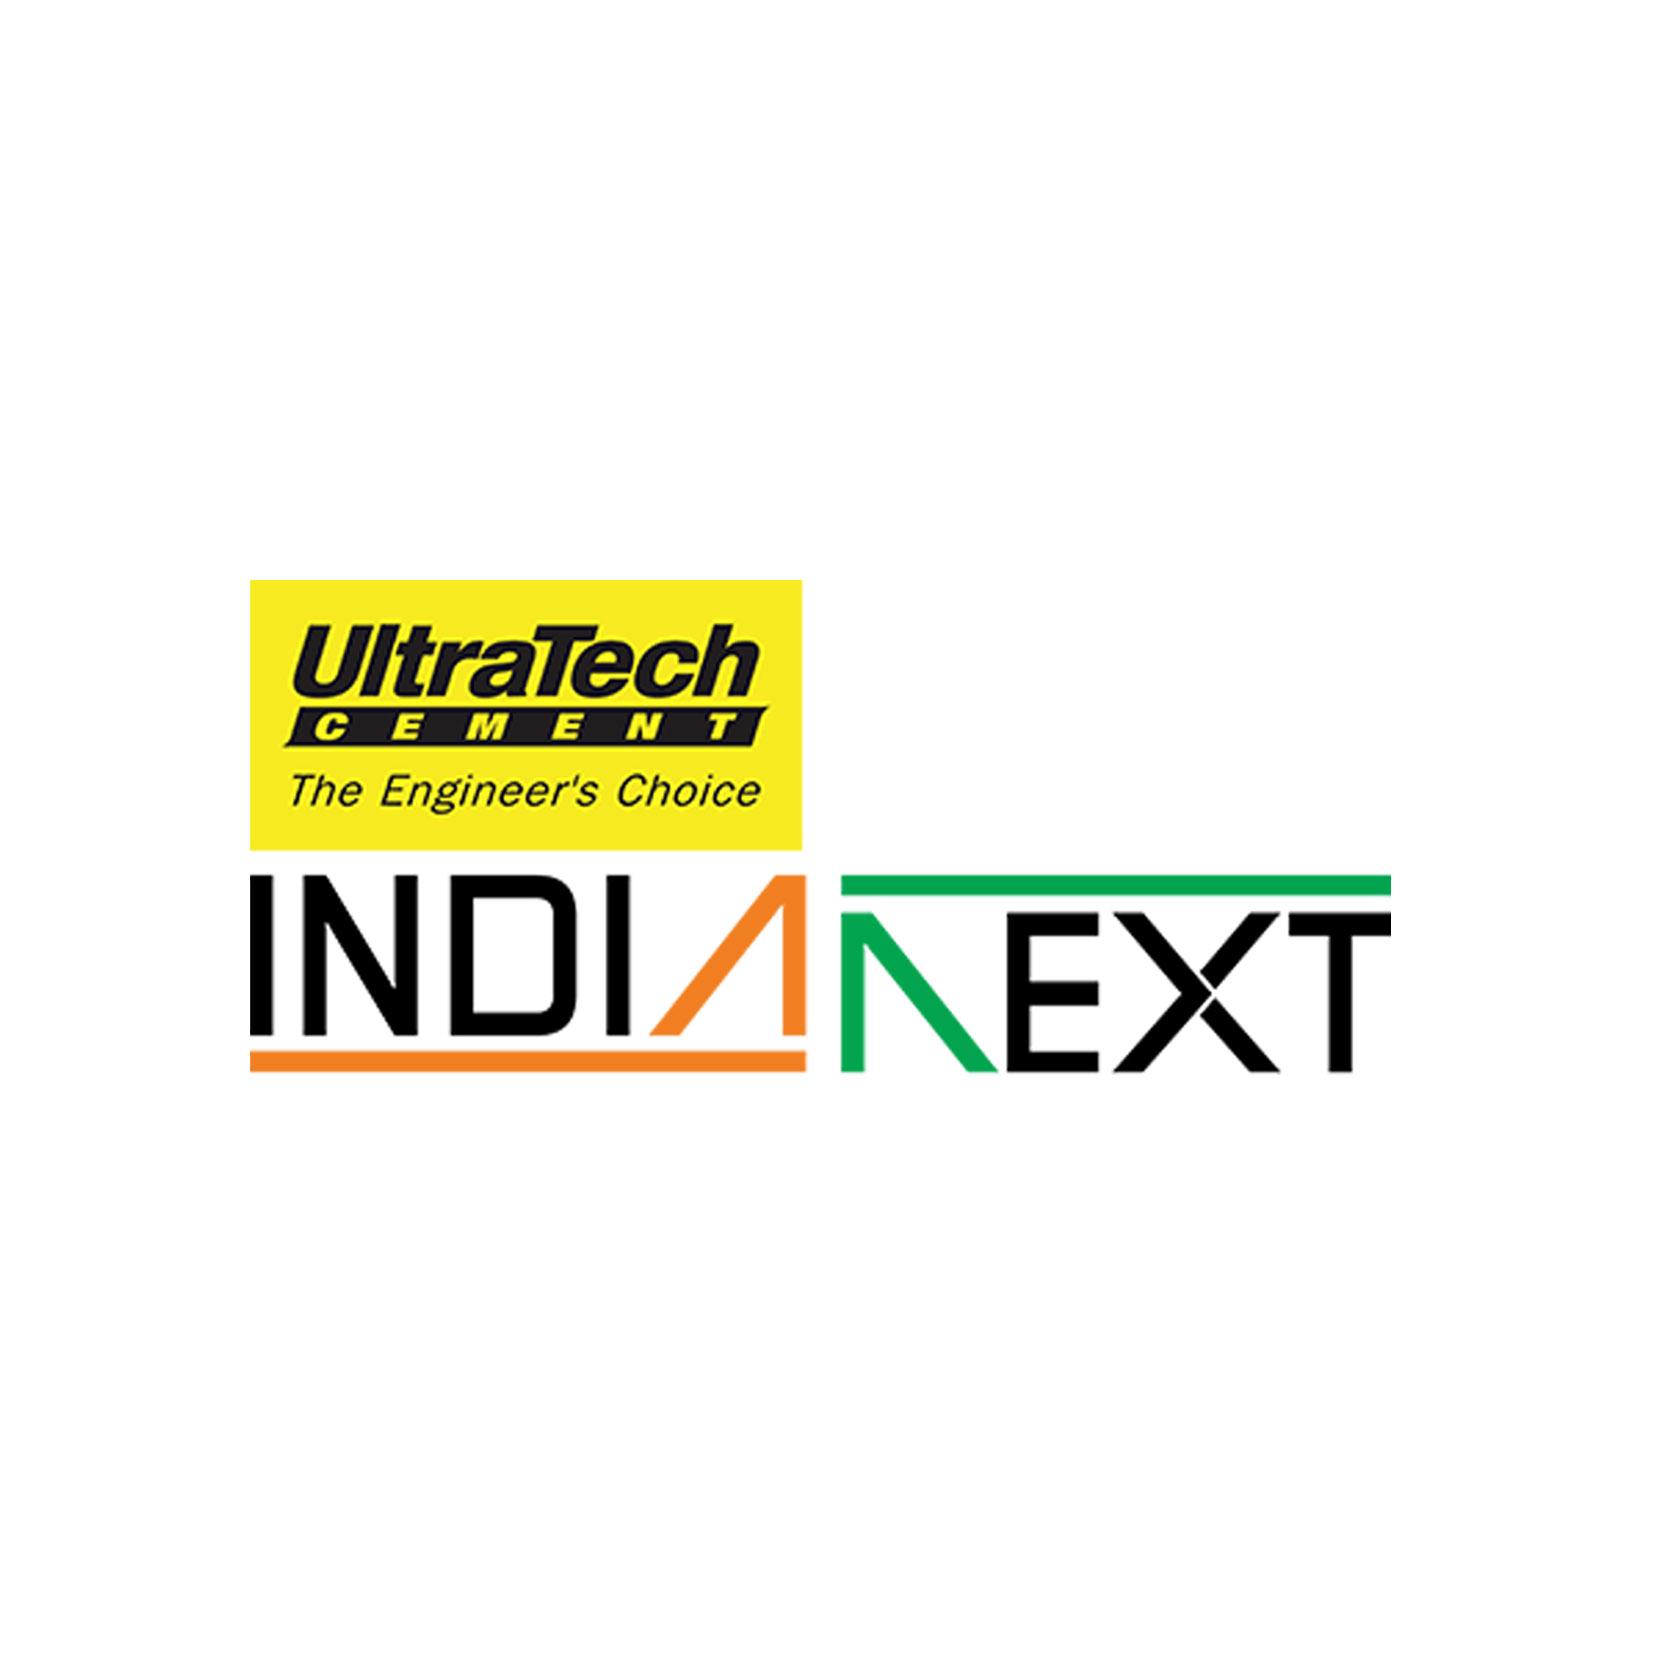 INDIA NEXT